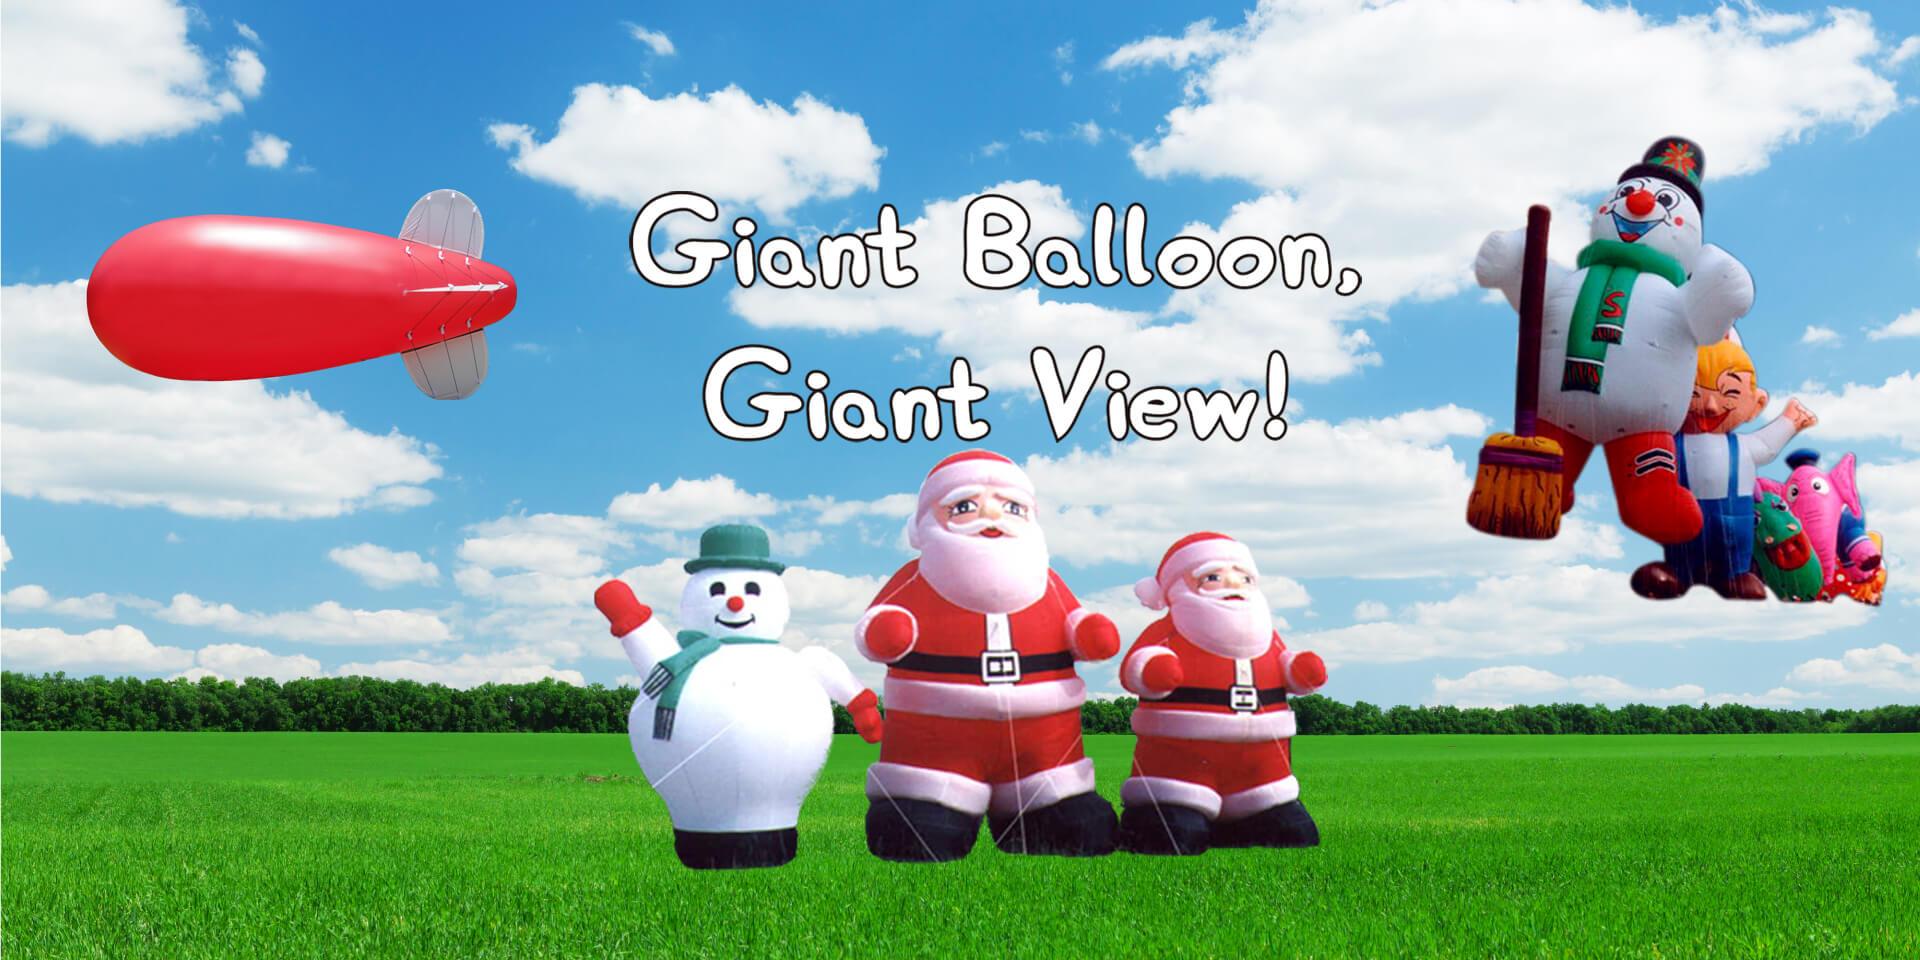 blimp-snowman-Santa-balloon